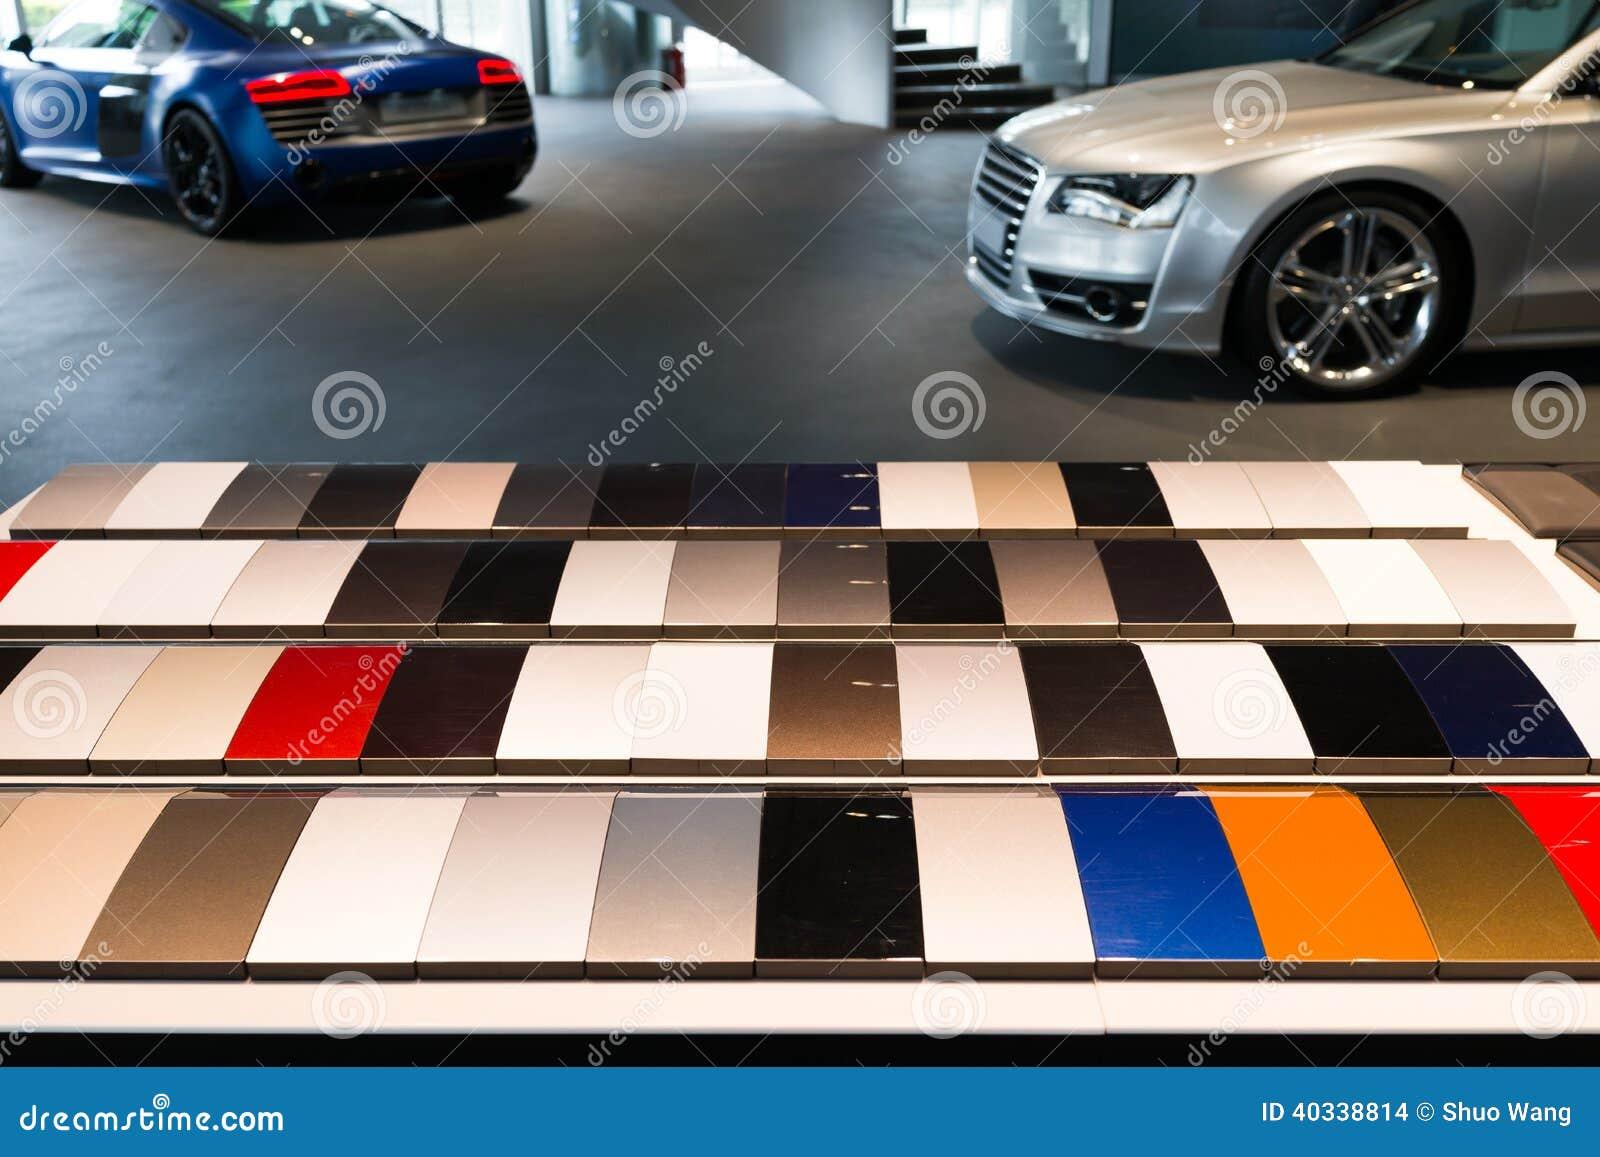 car paint samples stock photo image of golden colourful 40338814. Black Bedroom Furniture Sets. Home Design Ideas